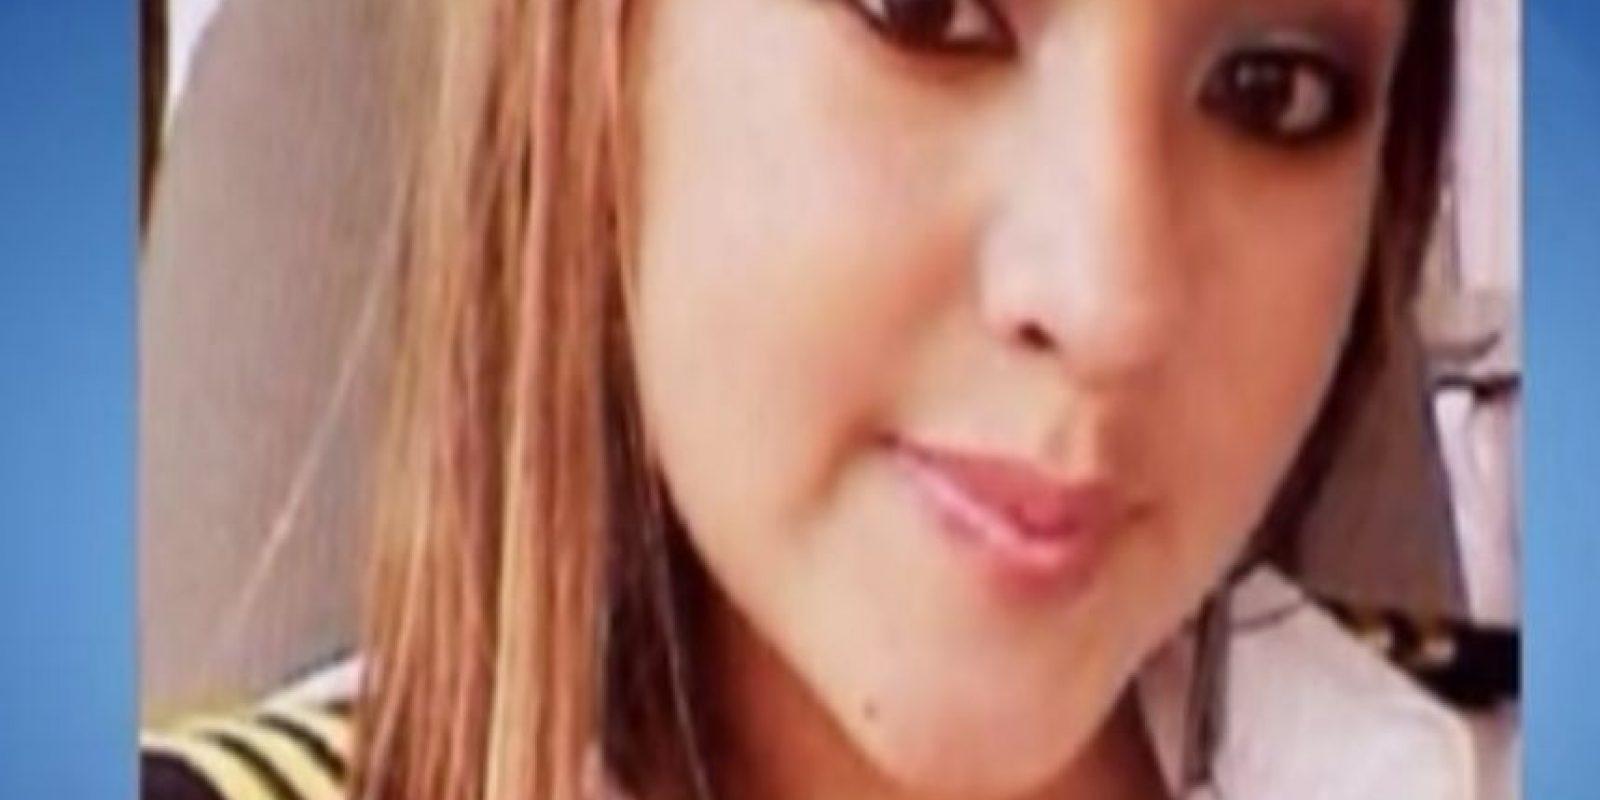 Cinthia Vanessa Ubaque Sandoval